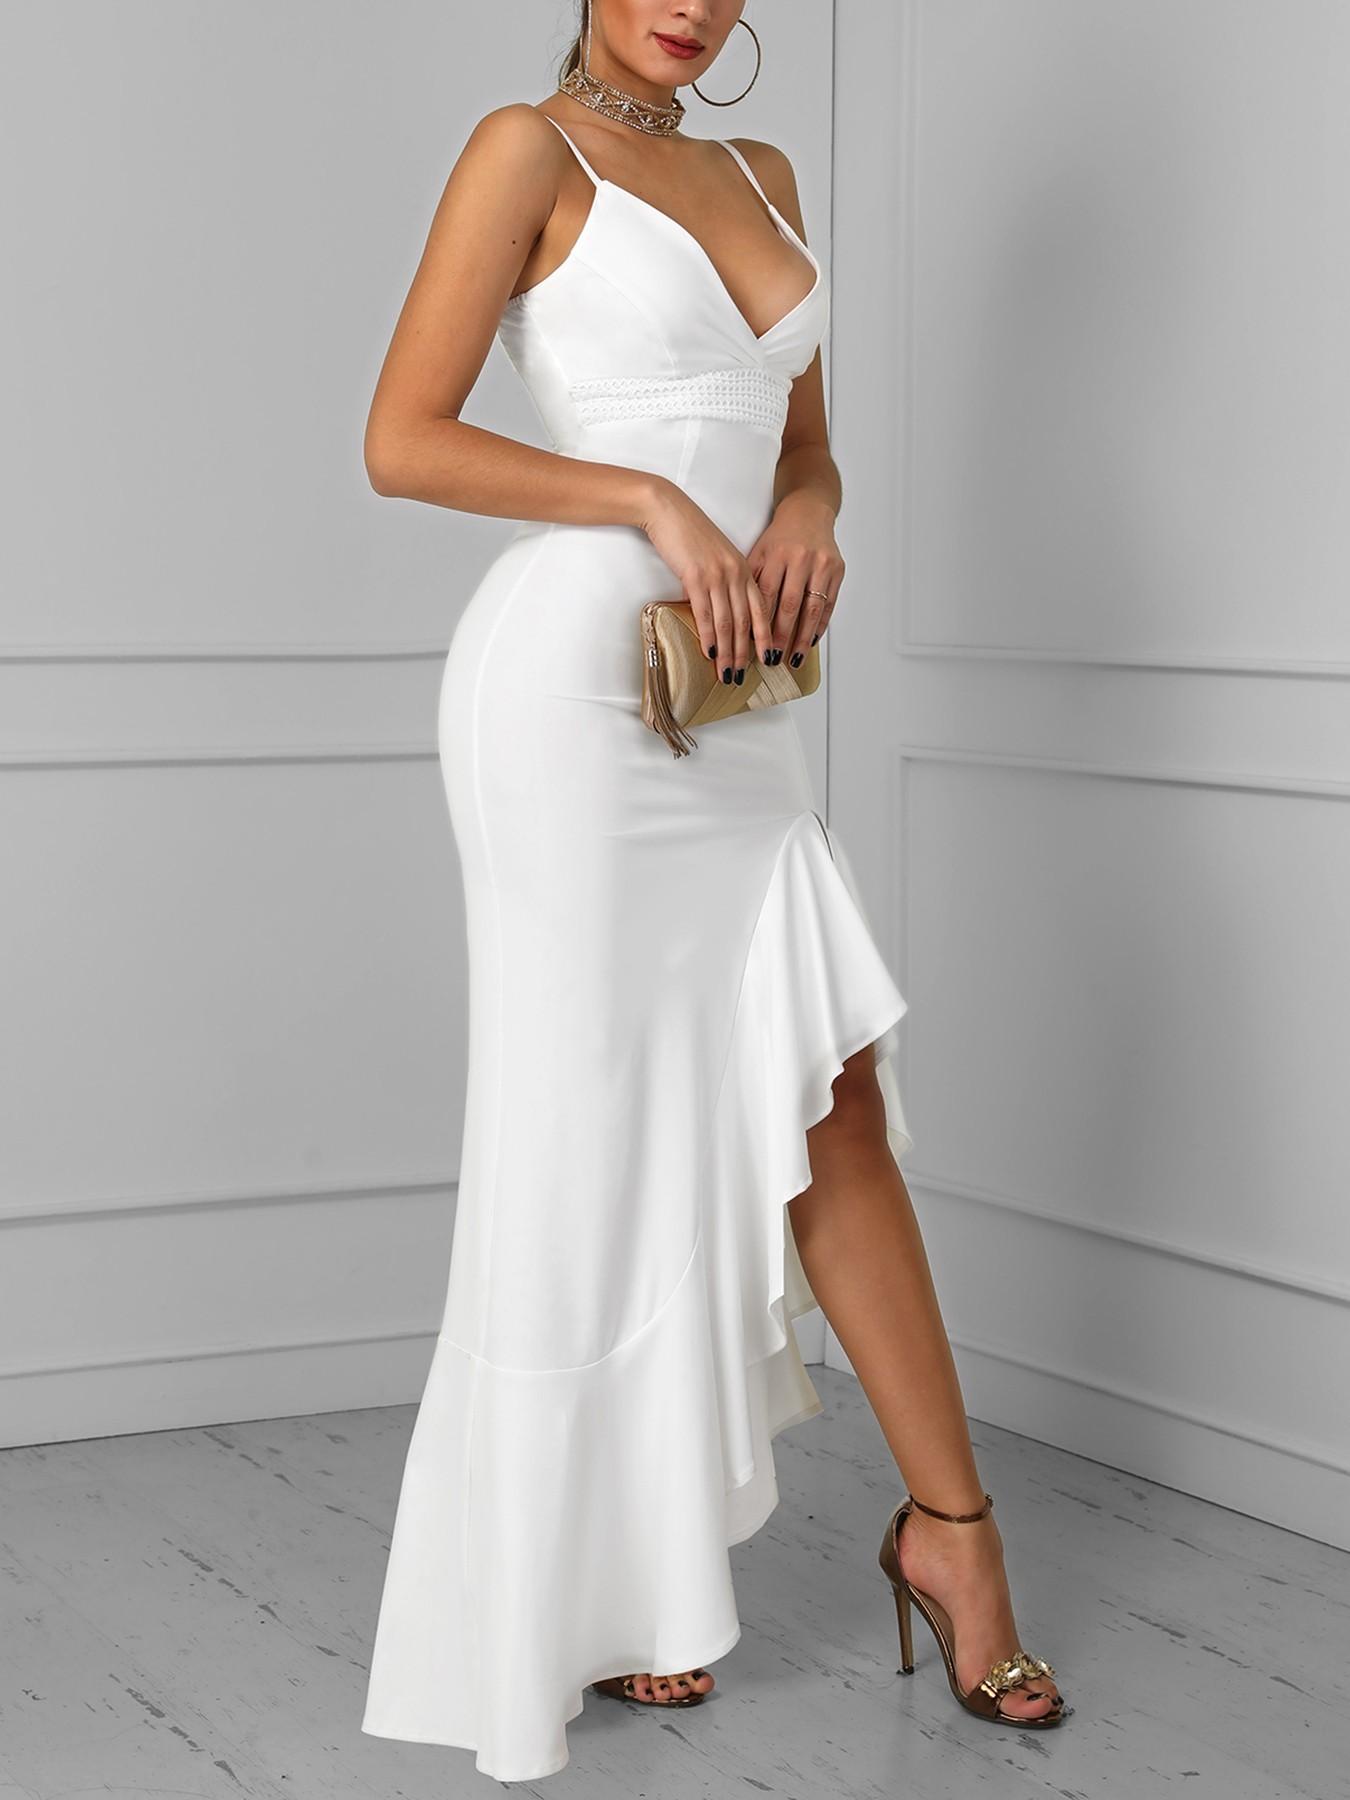 boutiquefeel / Solid Hollow Out Side Slit Flounced Irregular Dress